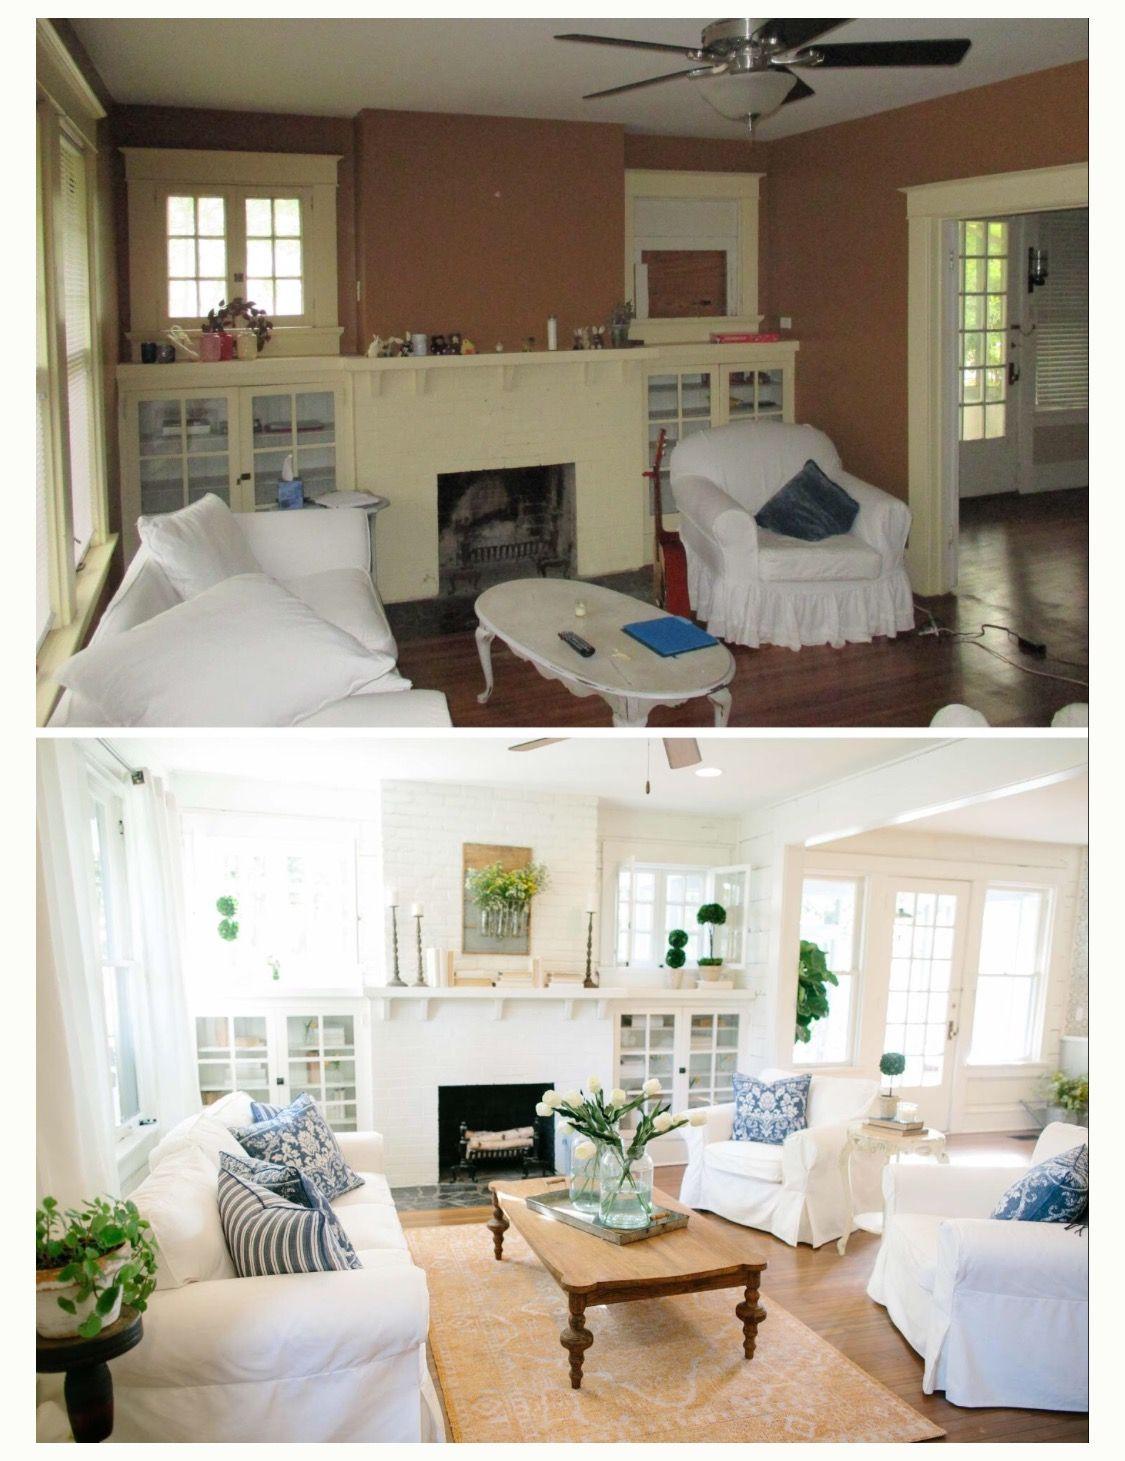 Fixer Upper Living Room Remodel Room Remodeling Fixer Upper Living Room #remodeling #small #living #room